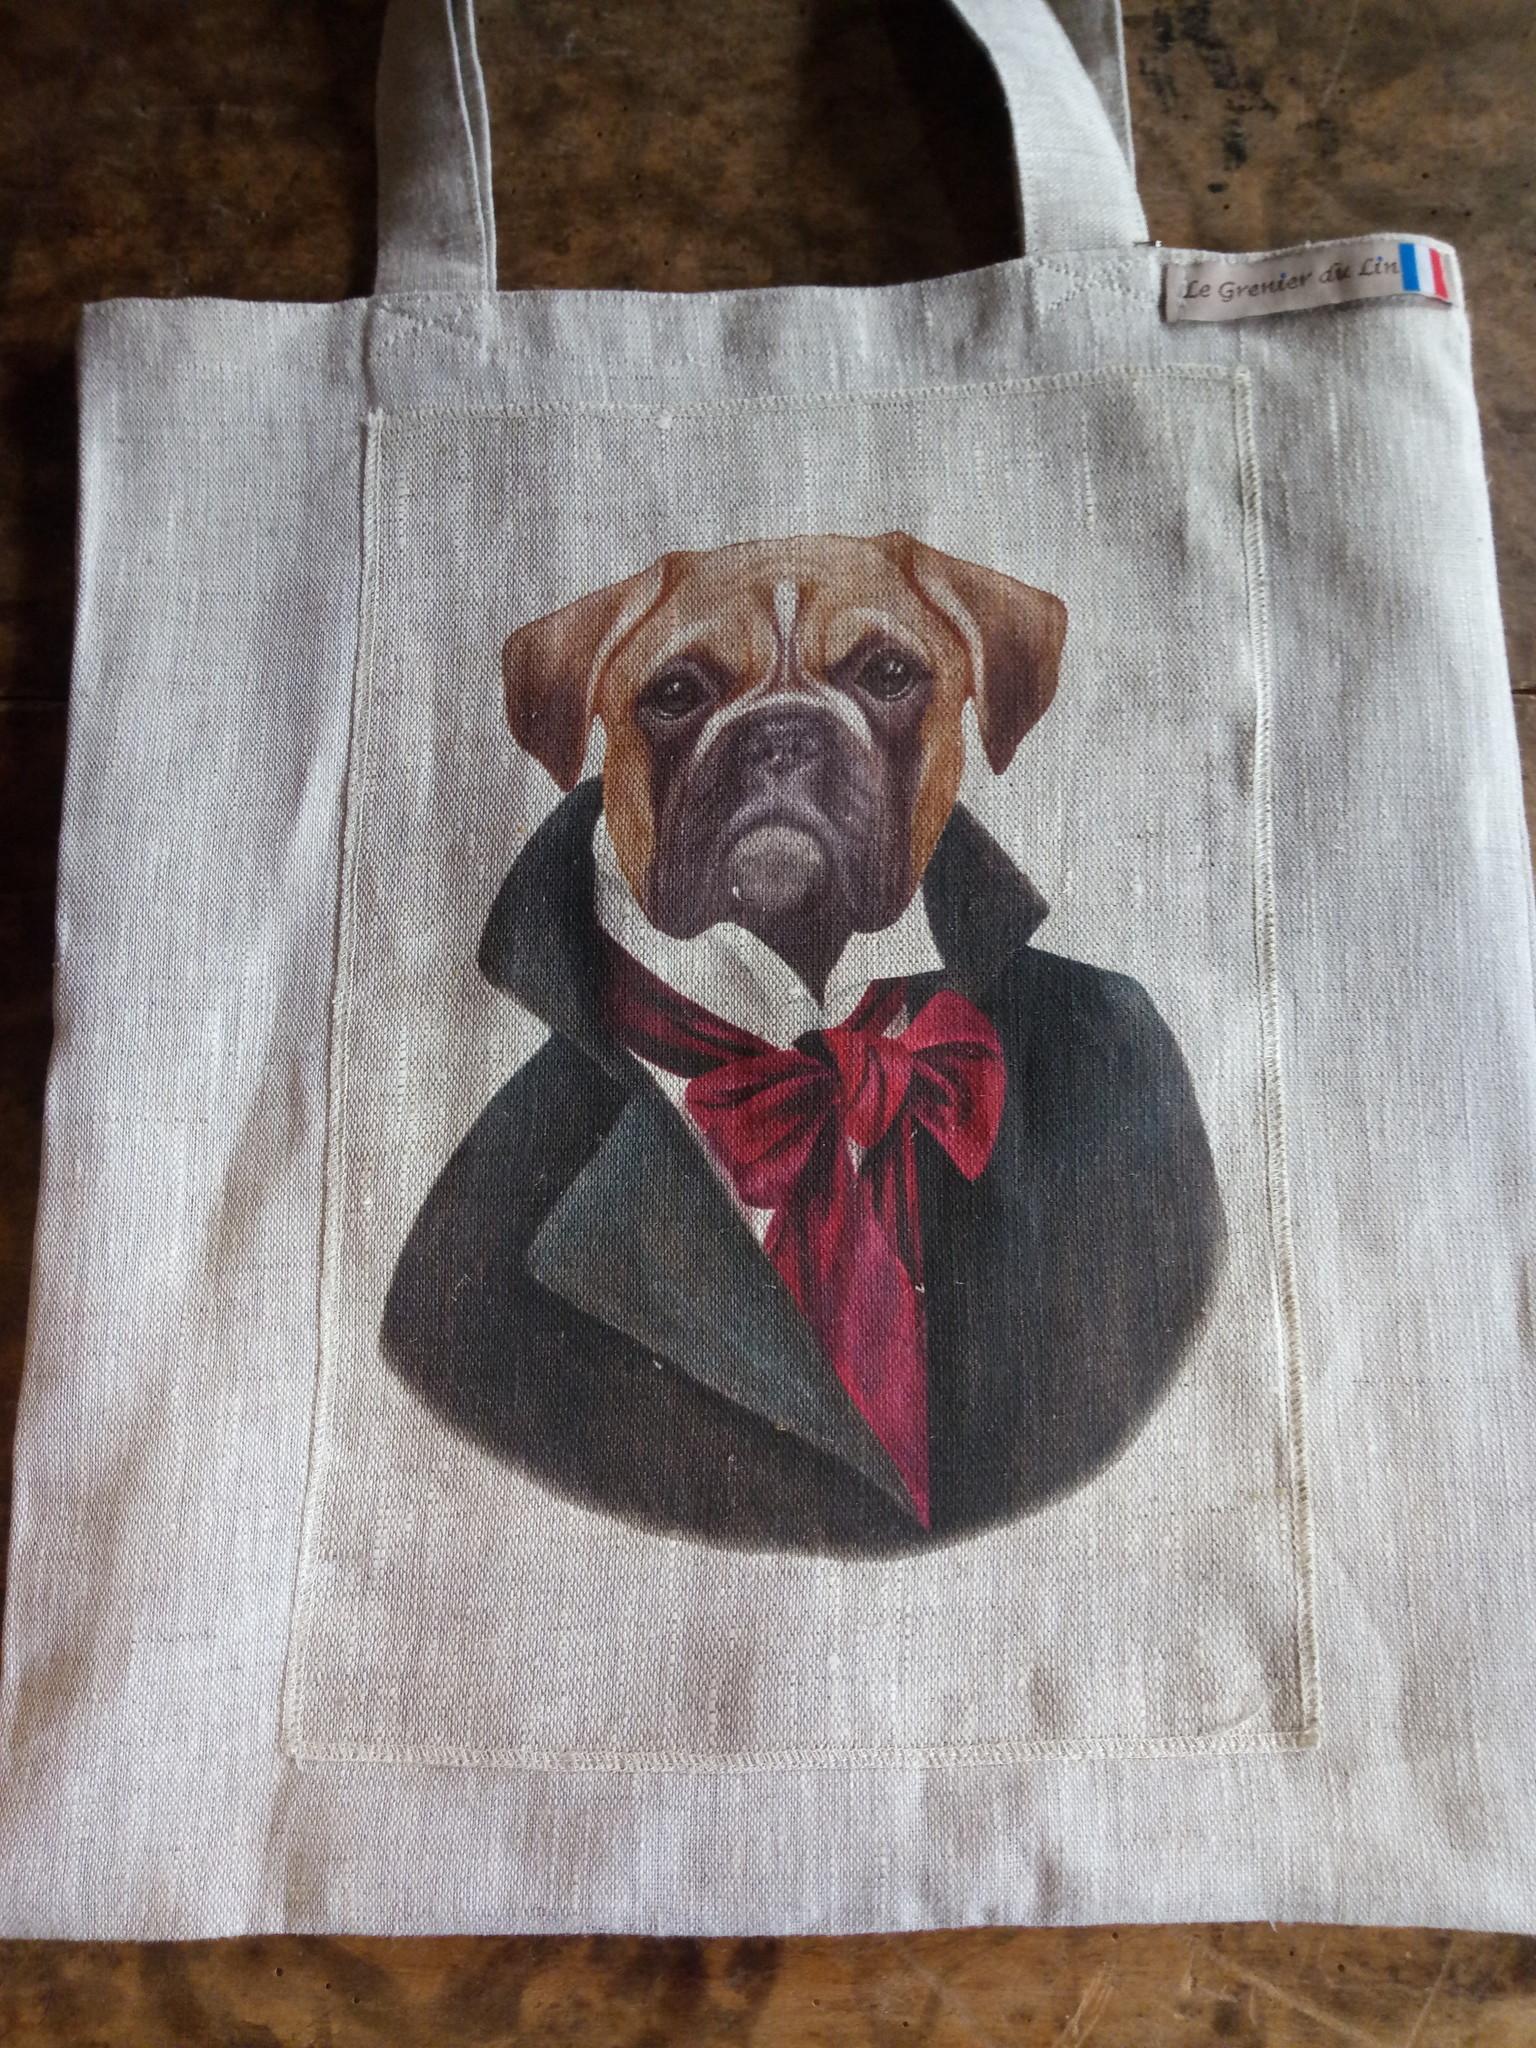 "Le grenier du lin sac "" bulldog """